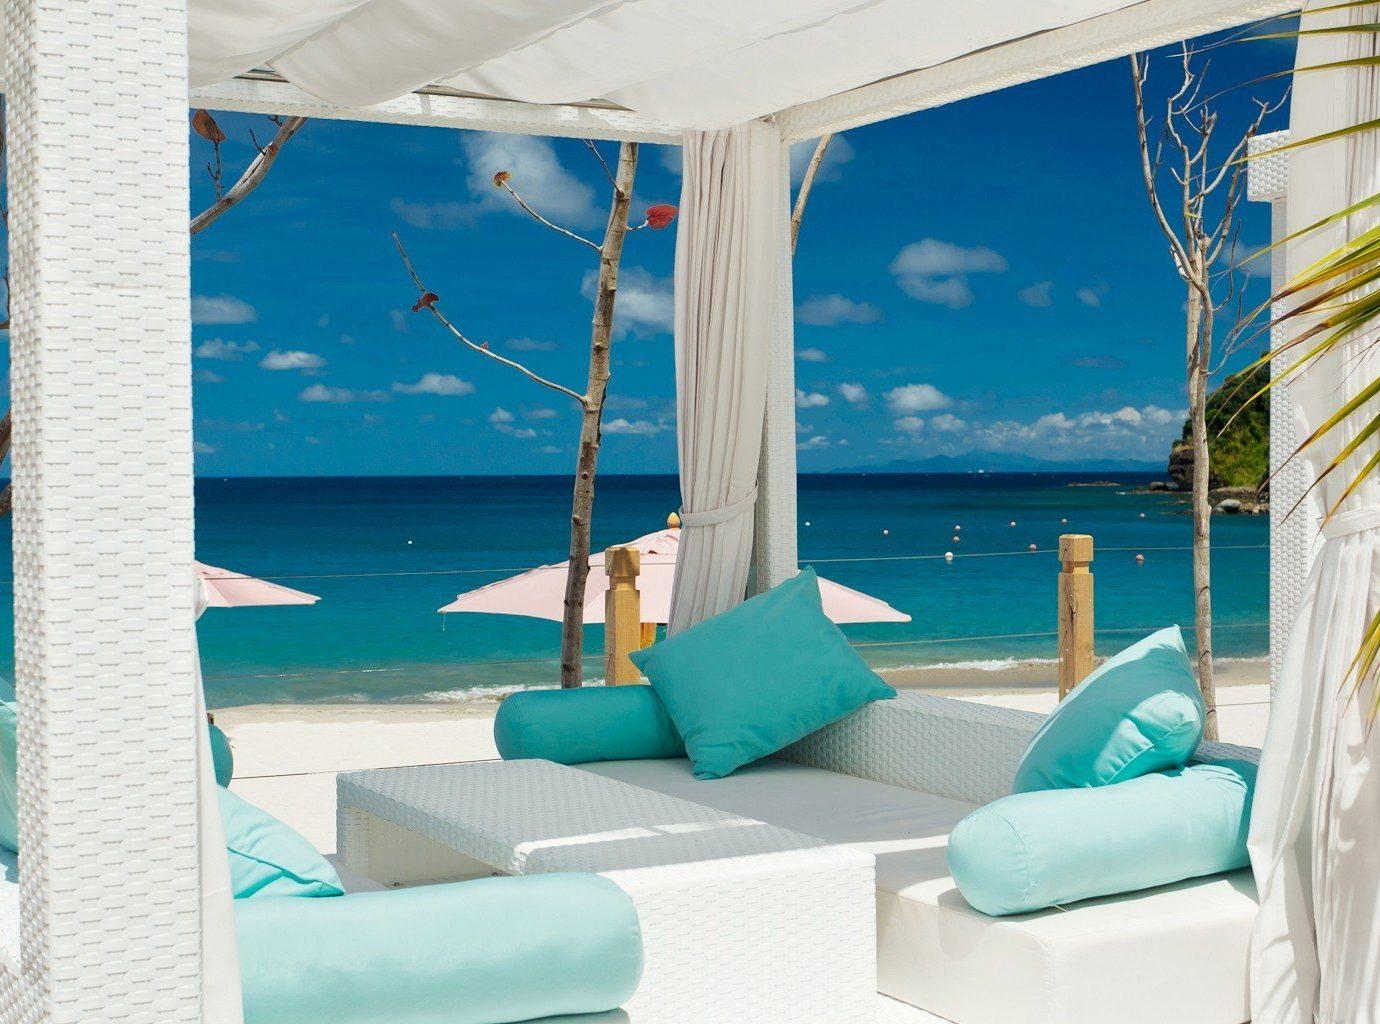 Hotels blue chair room swimming pool caribbean vacation Resort interior design estate Villa apartment furniture several